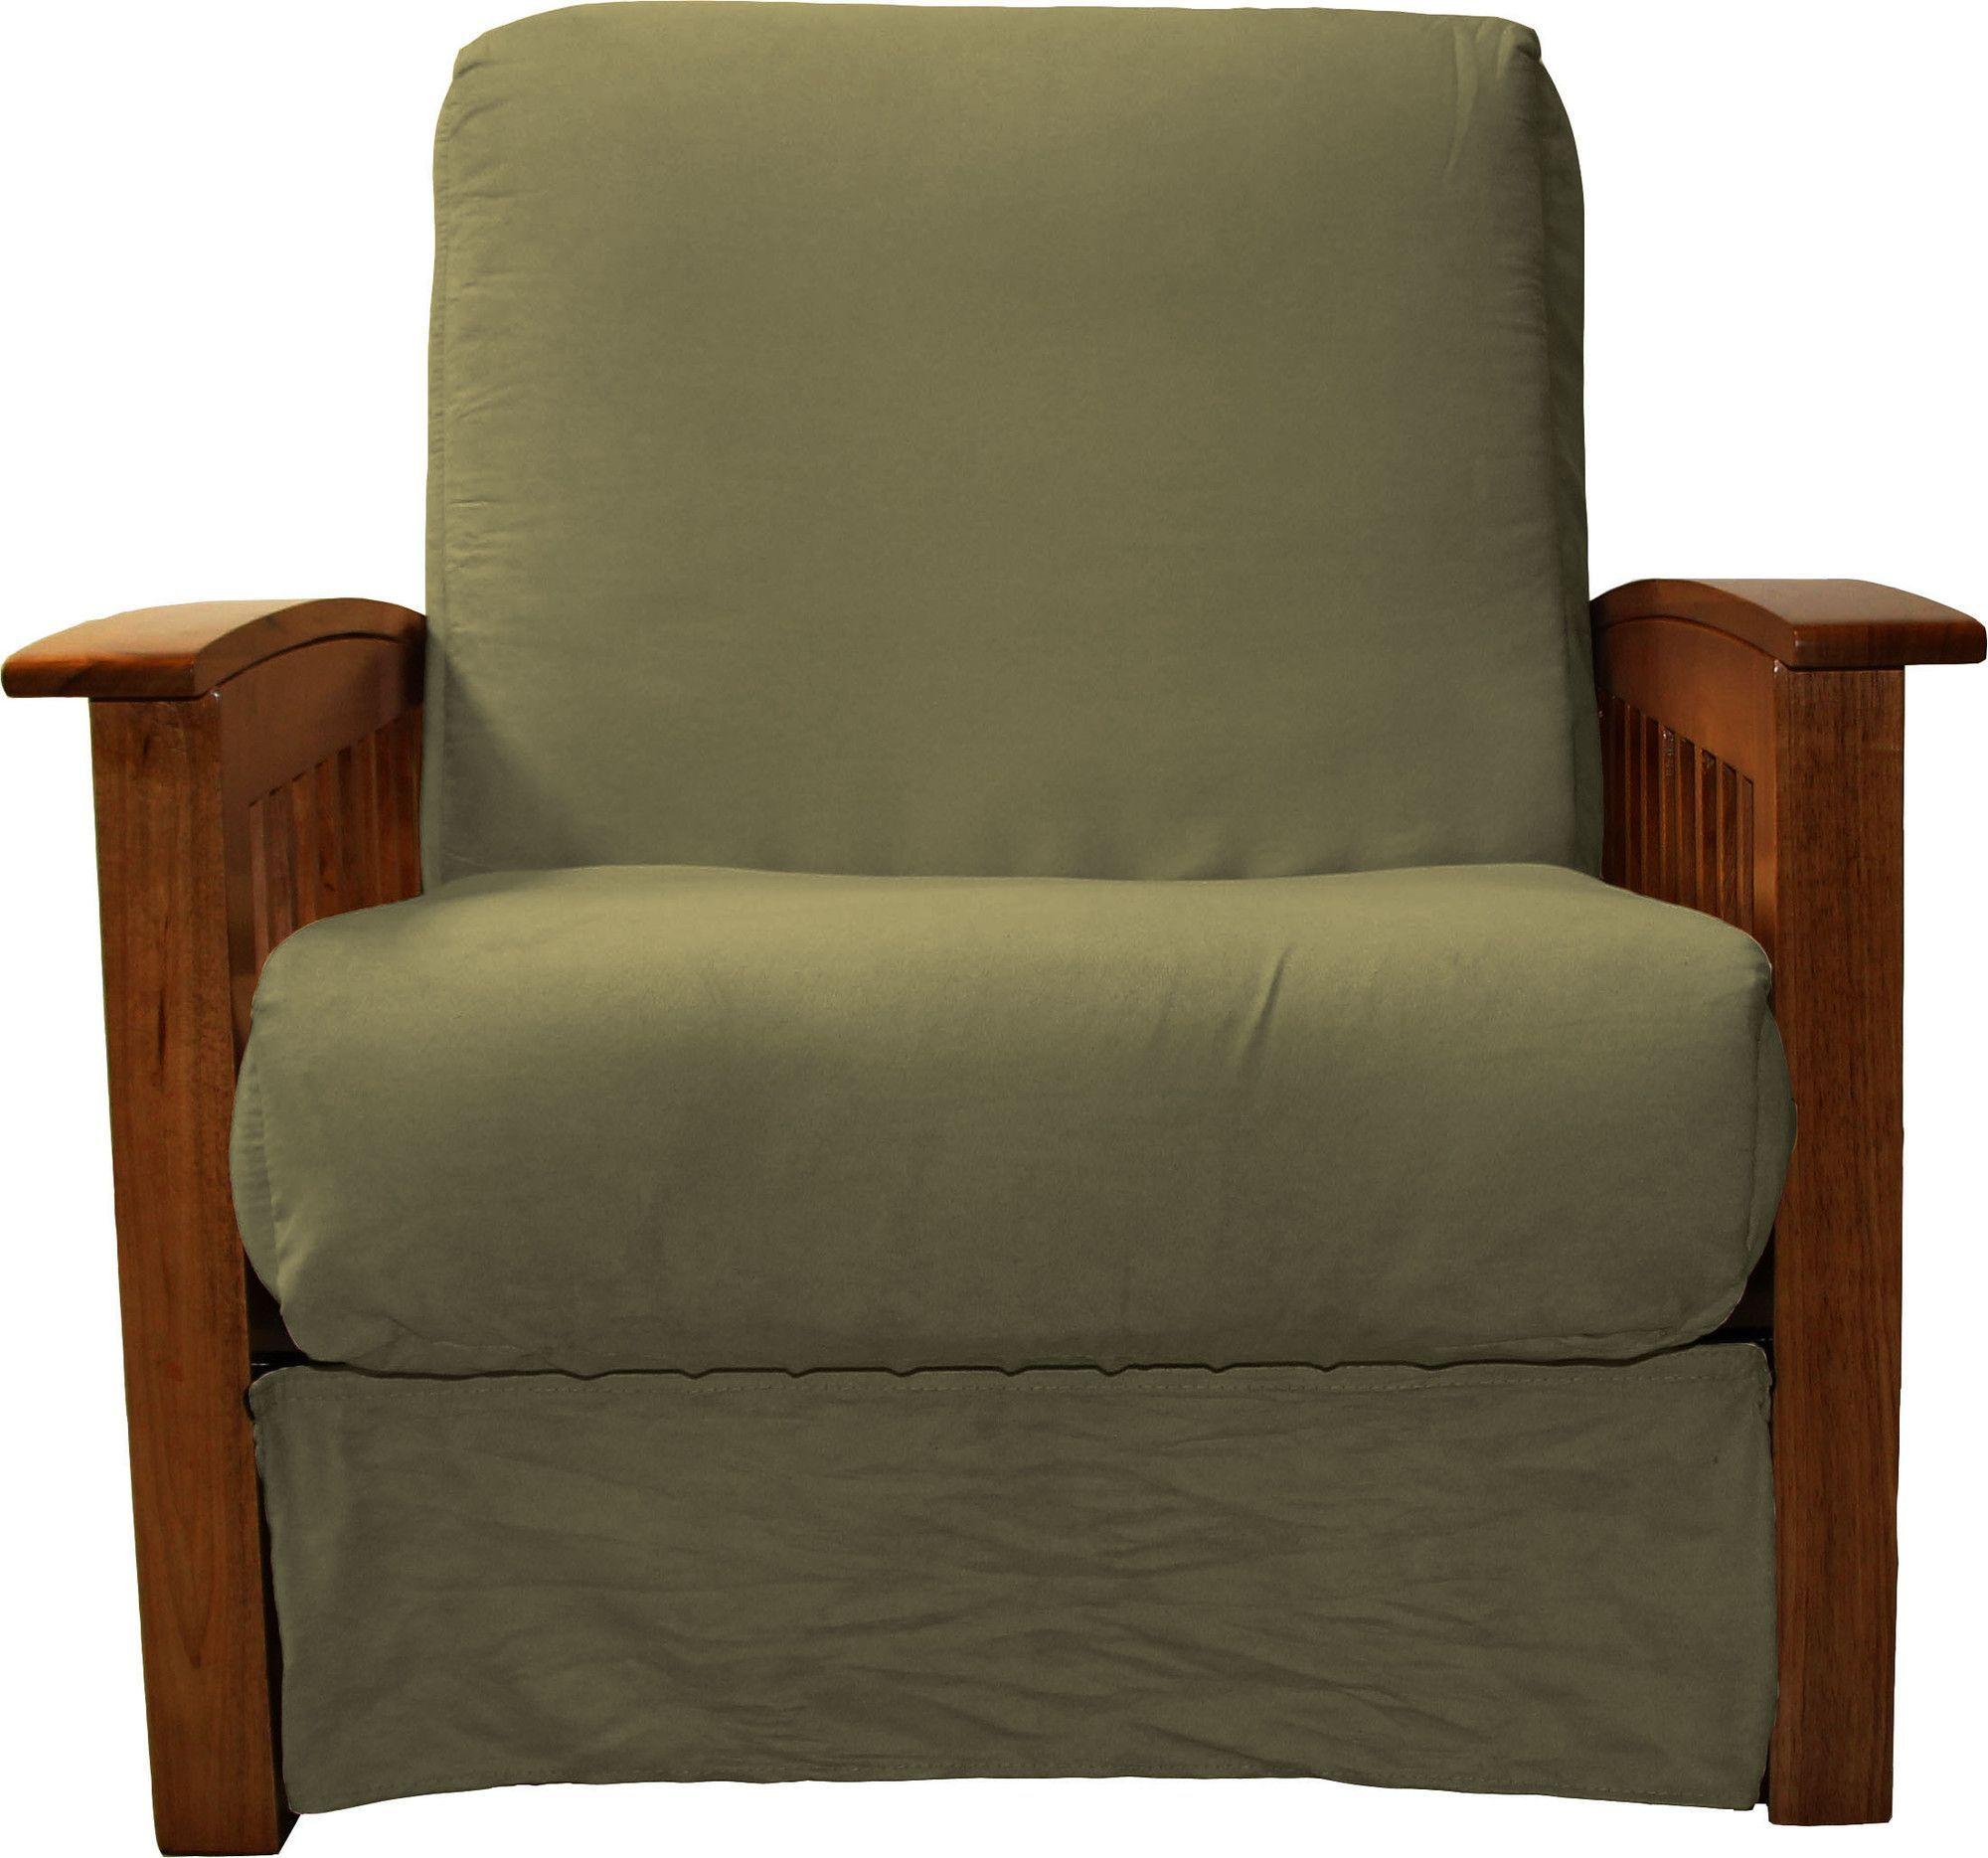 nantucket perfect sit n sleep inner spring pillow top chair